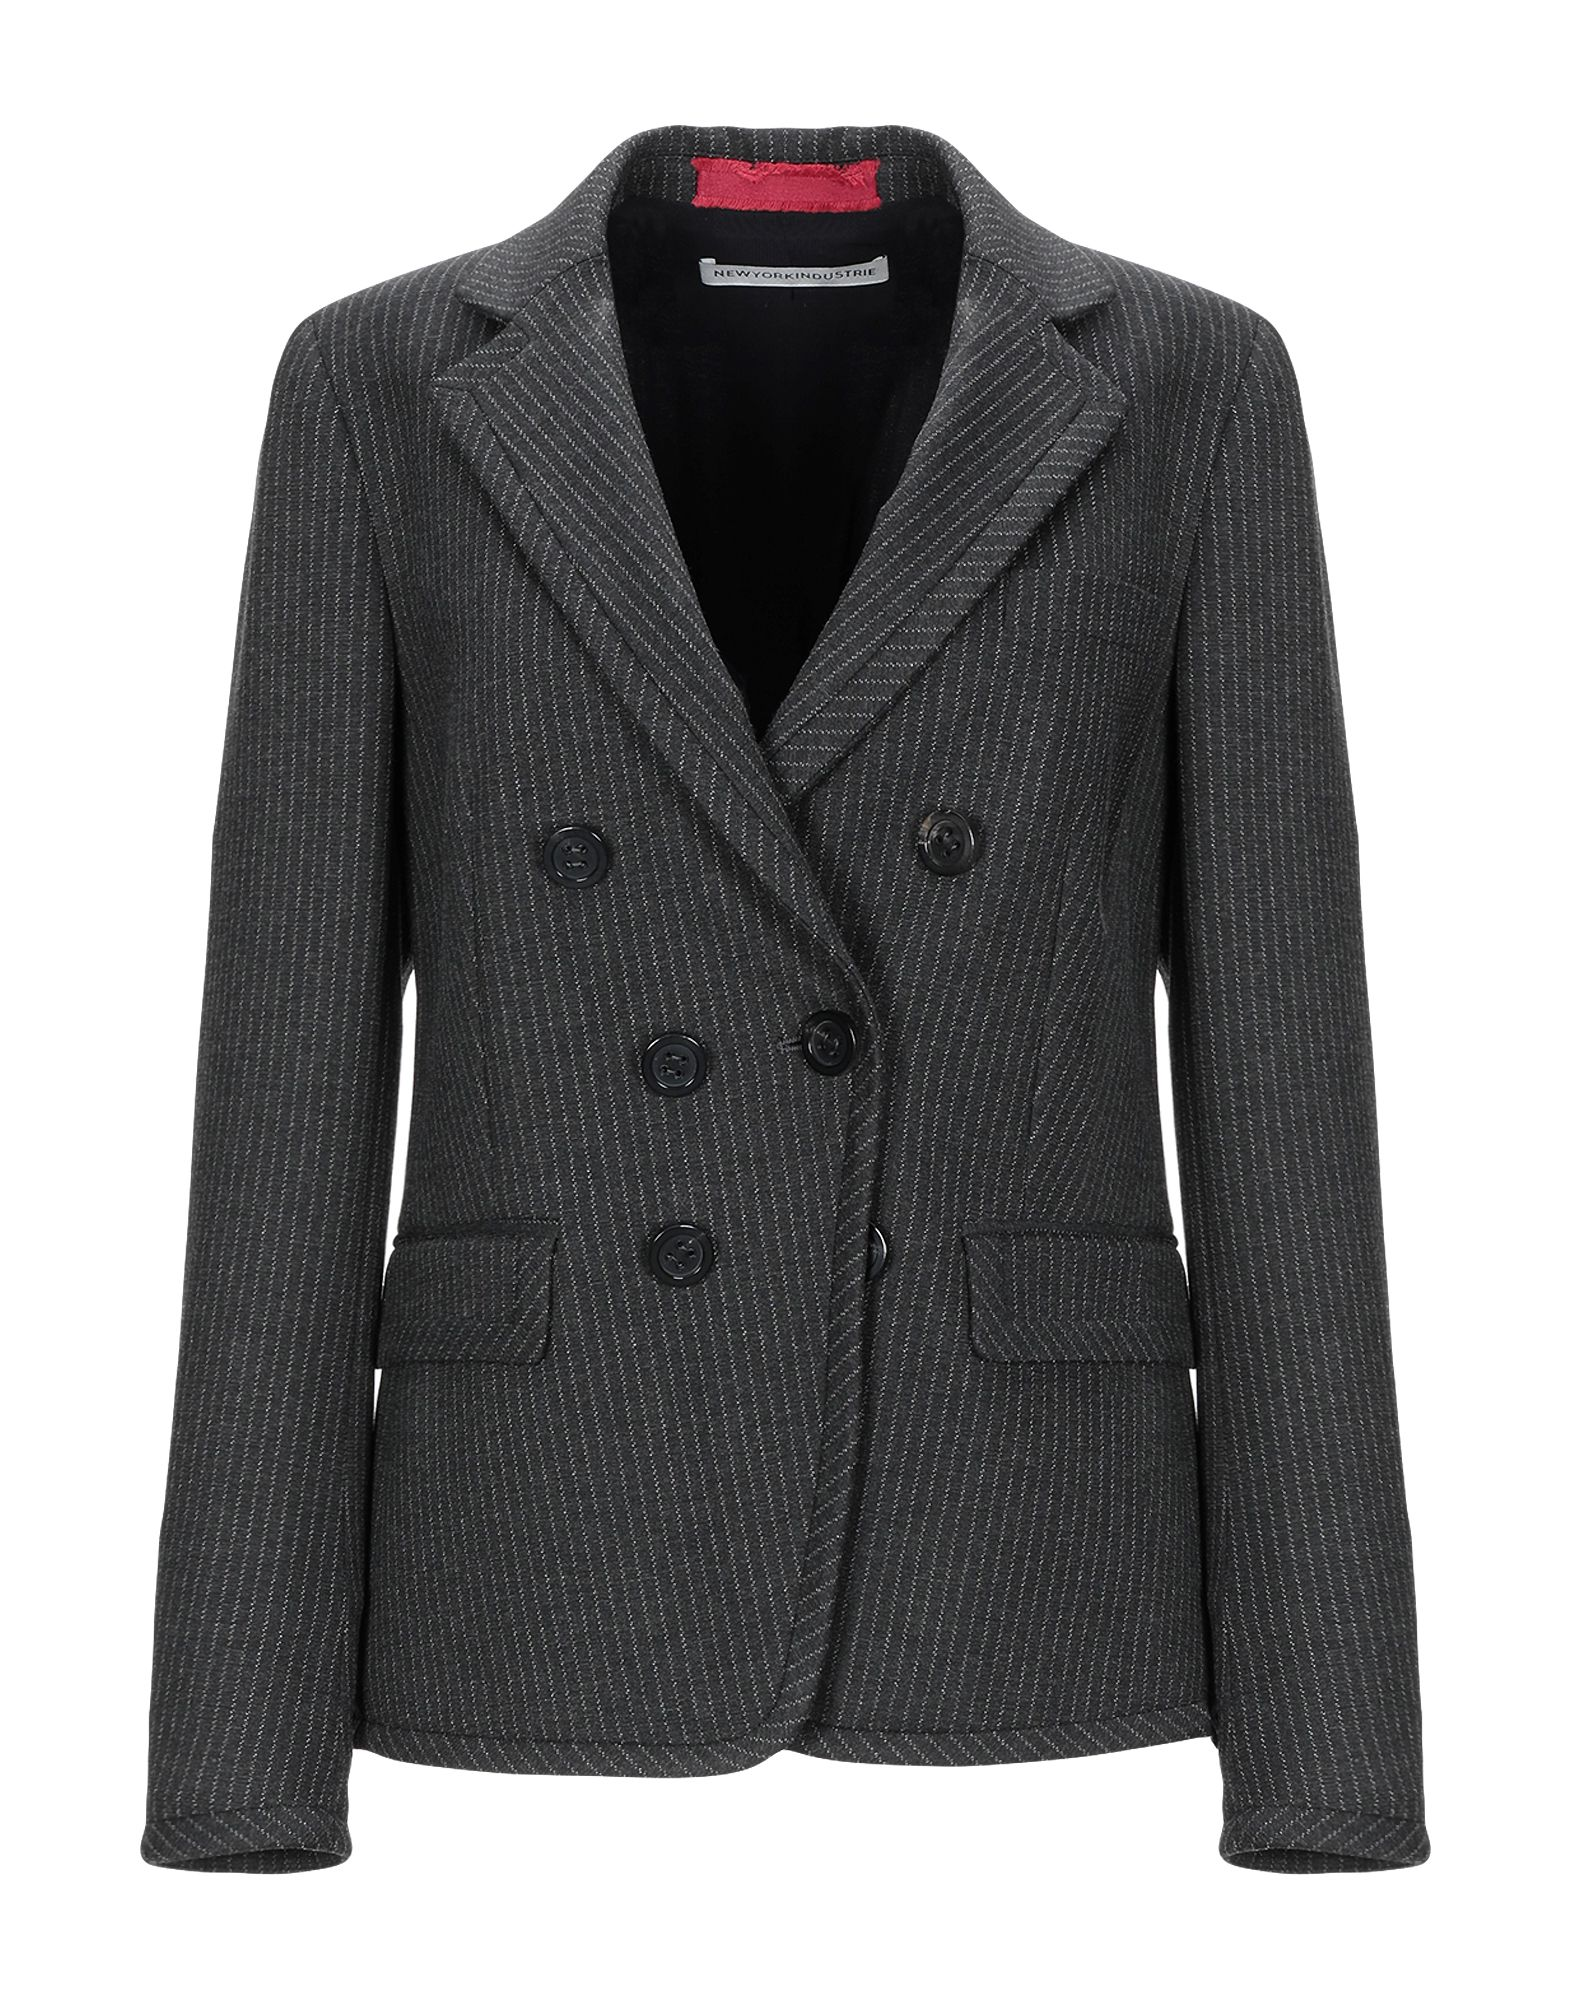 NEW YORK INDUSTRIE Suit jackets - Item 49492742